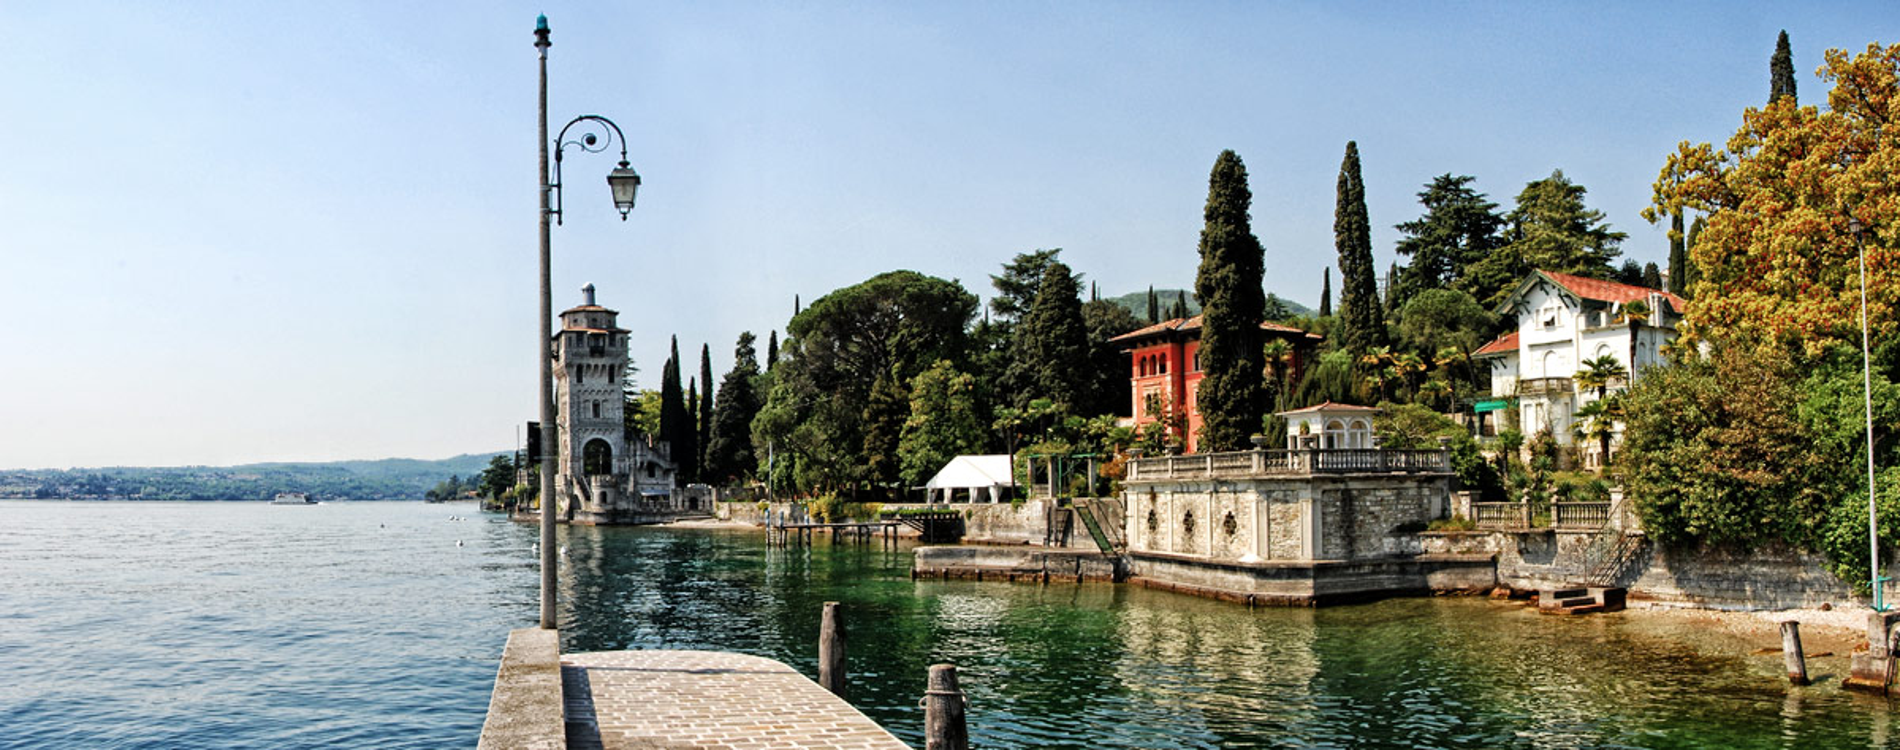 Gardone Sul Lago Di Garda